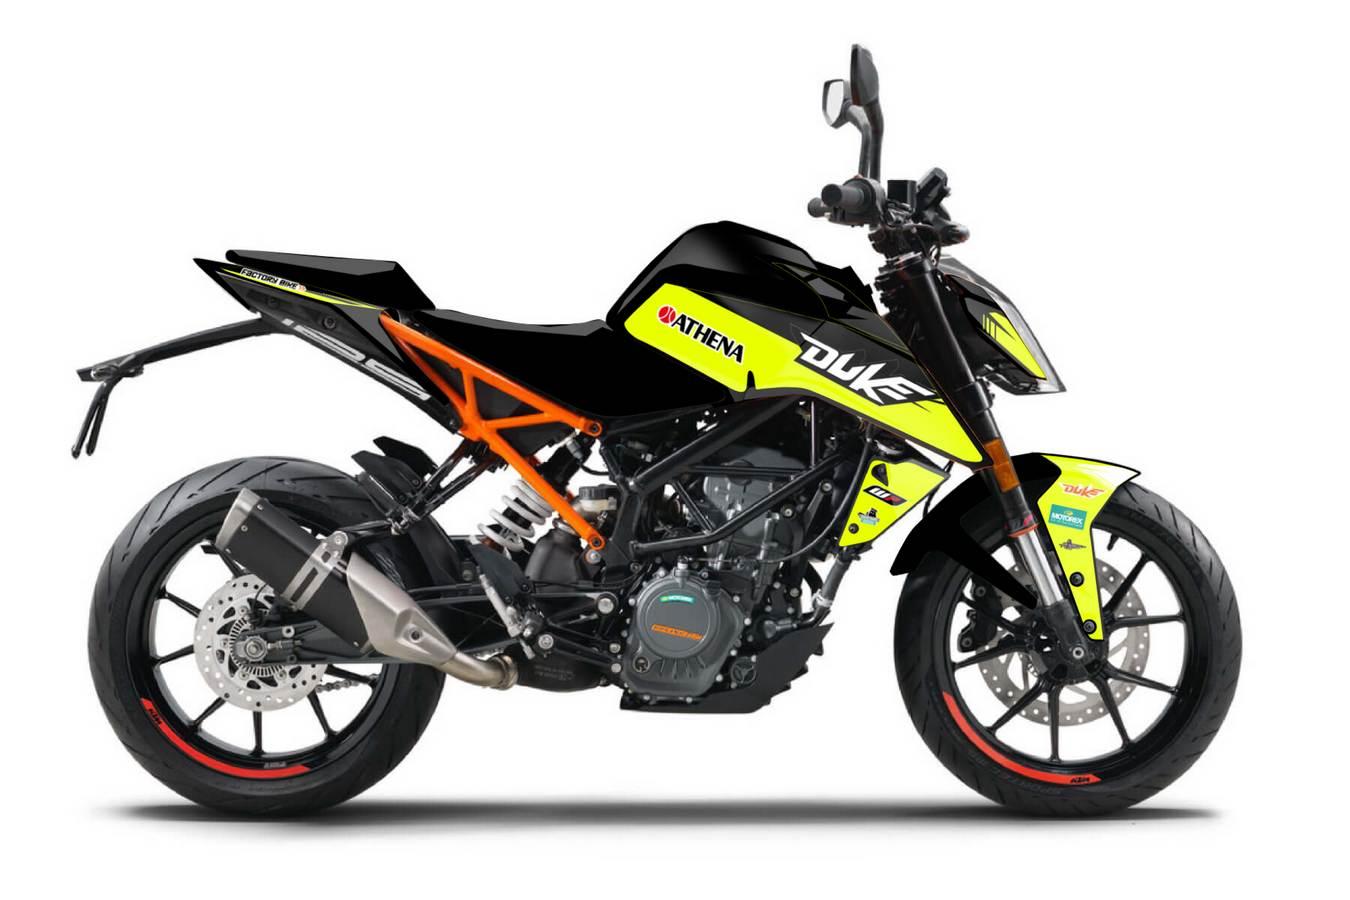 KTM Duke 125 200 390 2020 Aufkleber Satz neon gelb Powerparts Factory Look Dekor Motorradaufkleber